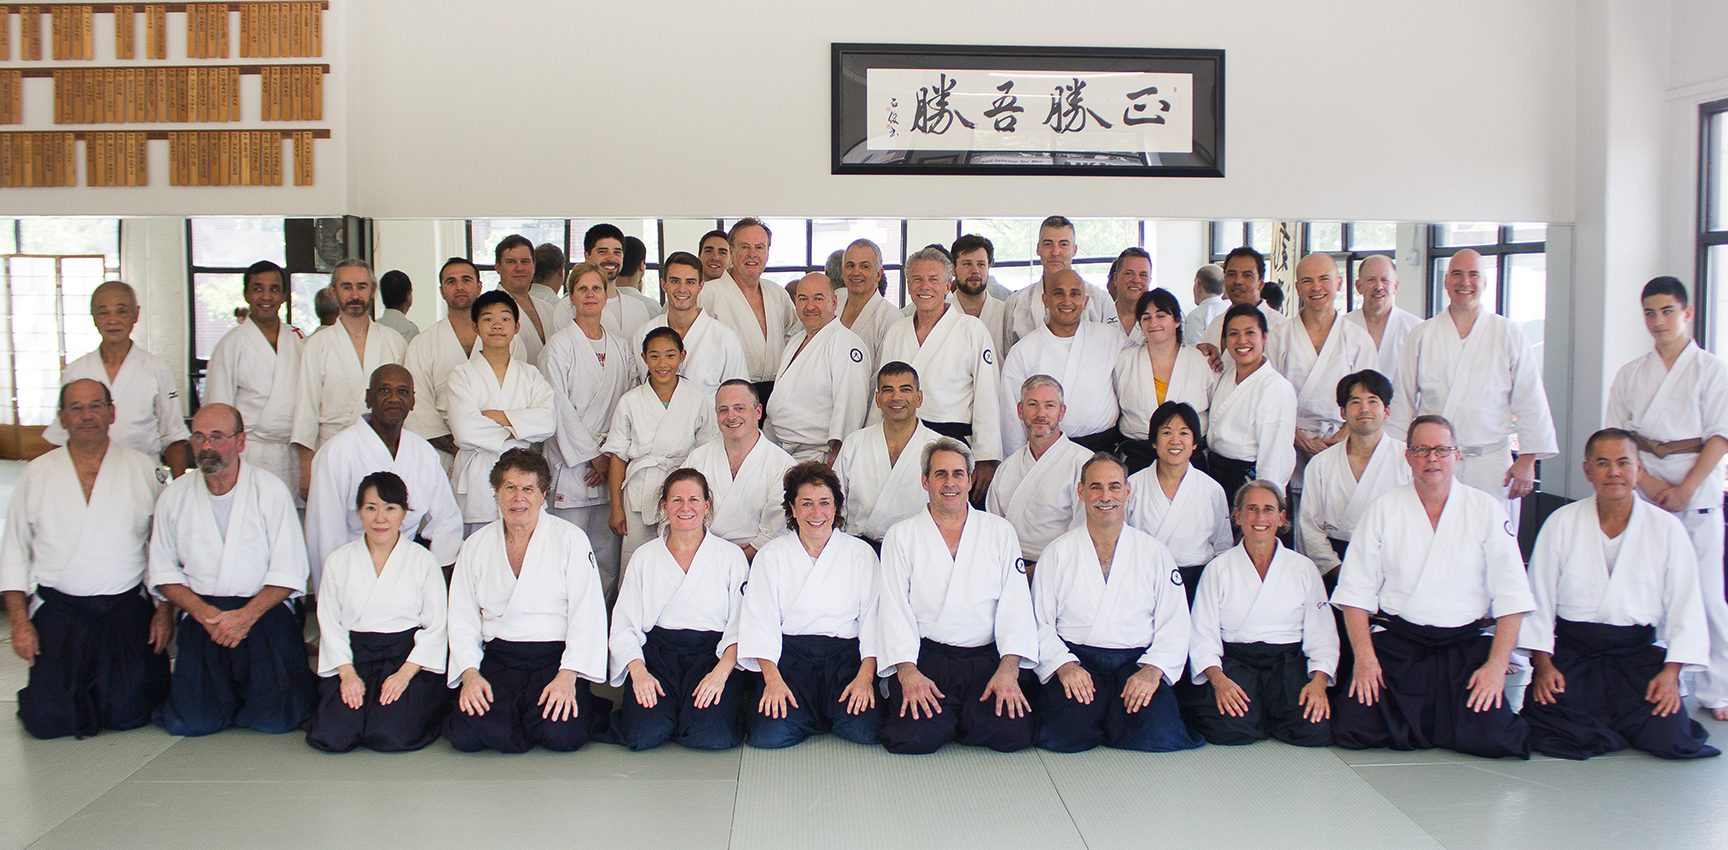 Pavlick Sensei's classes left us all inspired. Post class group picture taken 9/10/16 | Photo: Tamara Magnitsky